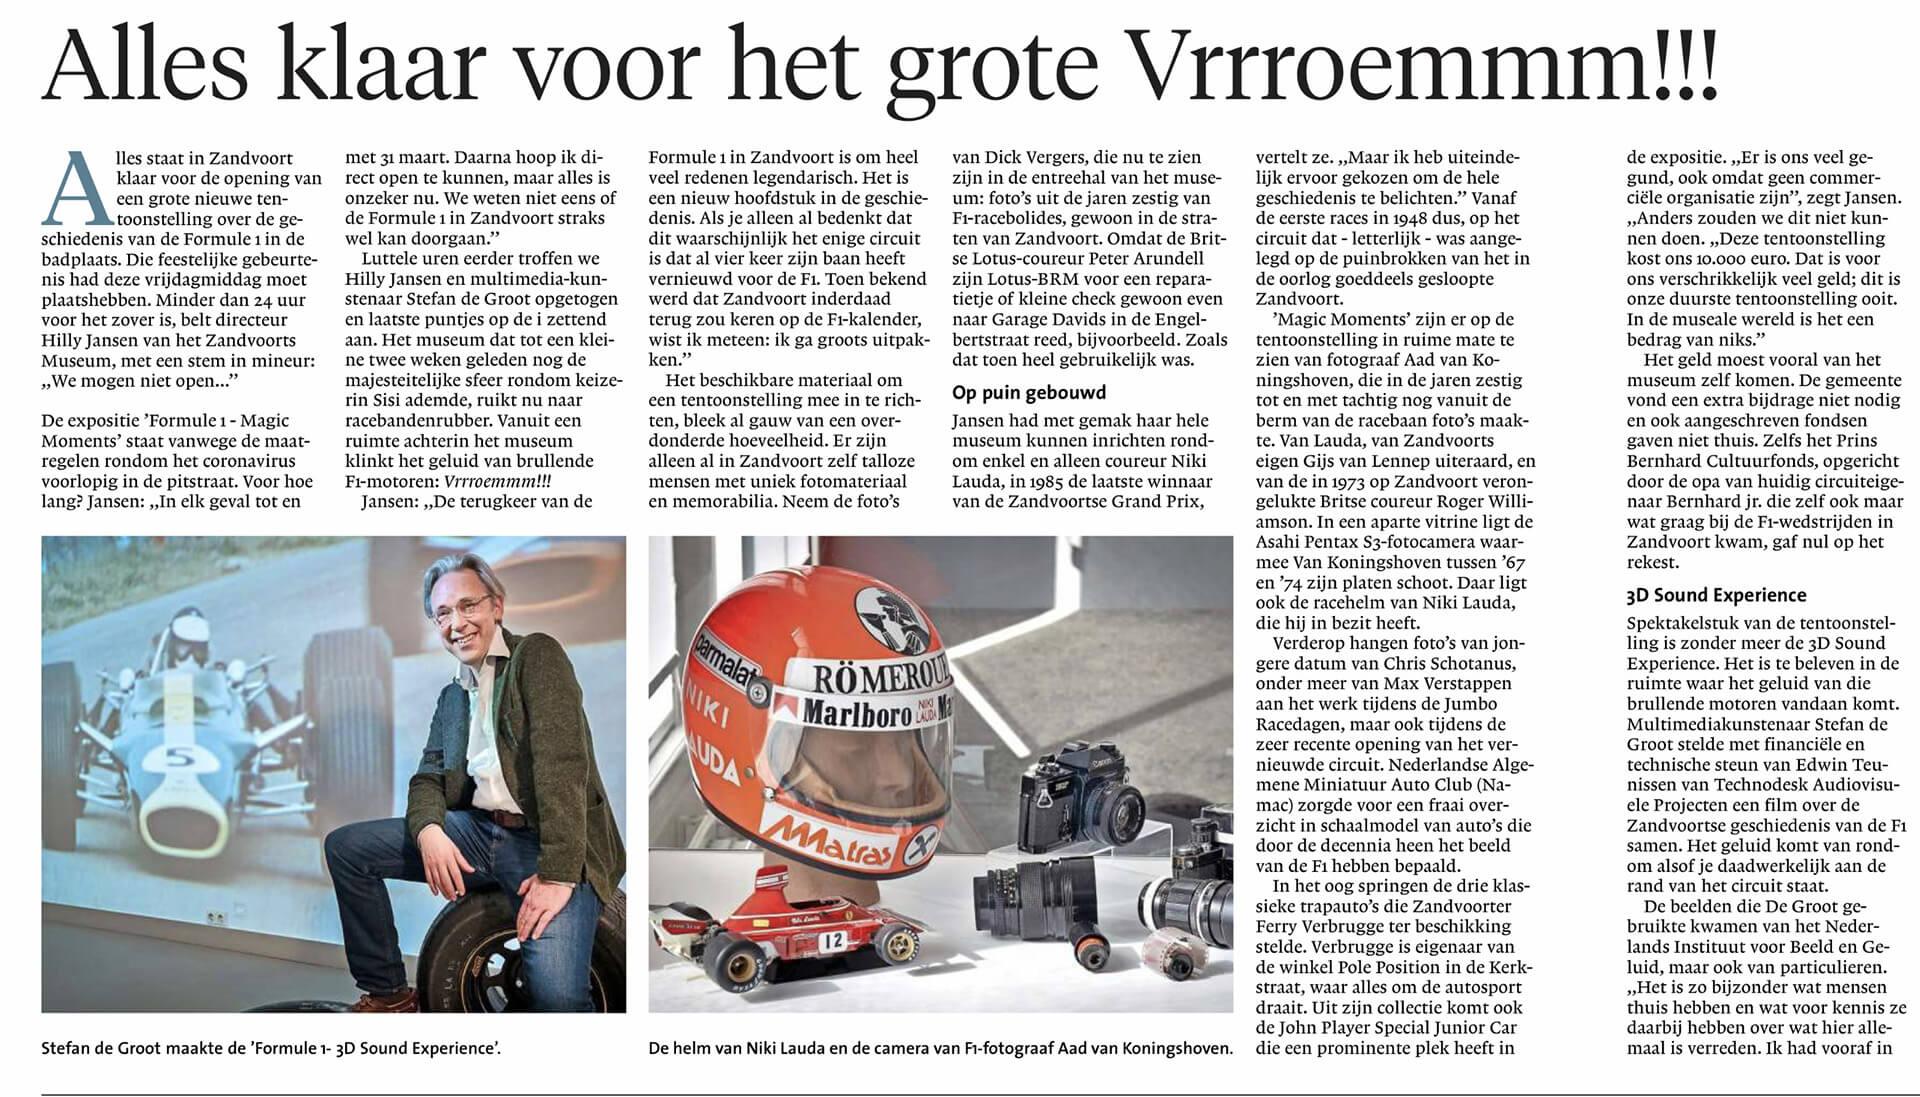 Haarlems Dagblad 14 maart 2020 Stefan de Groot